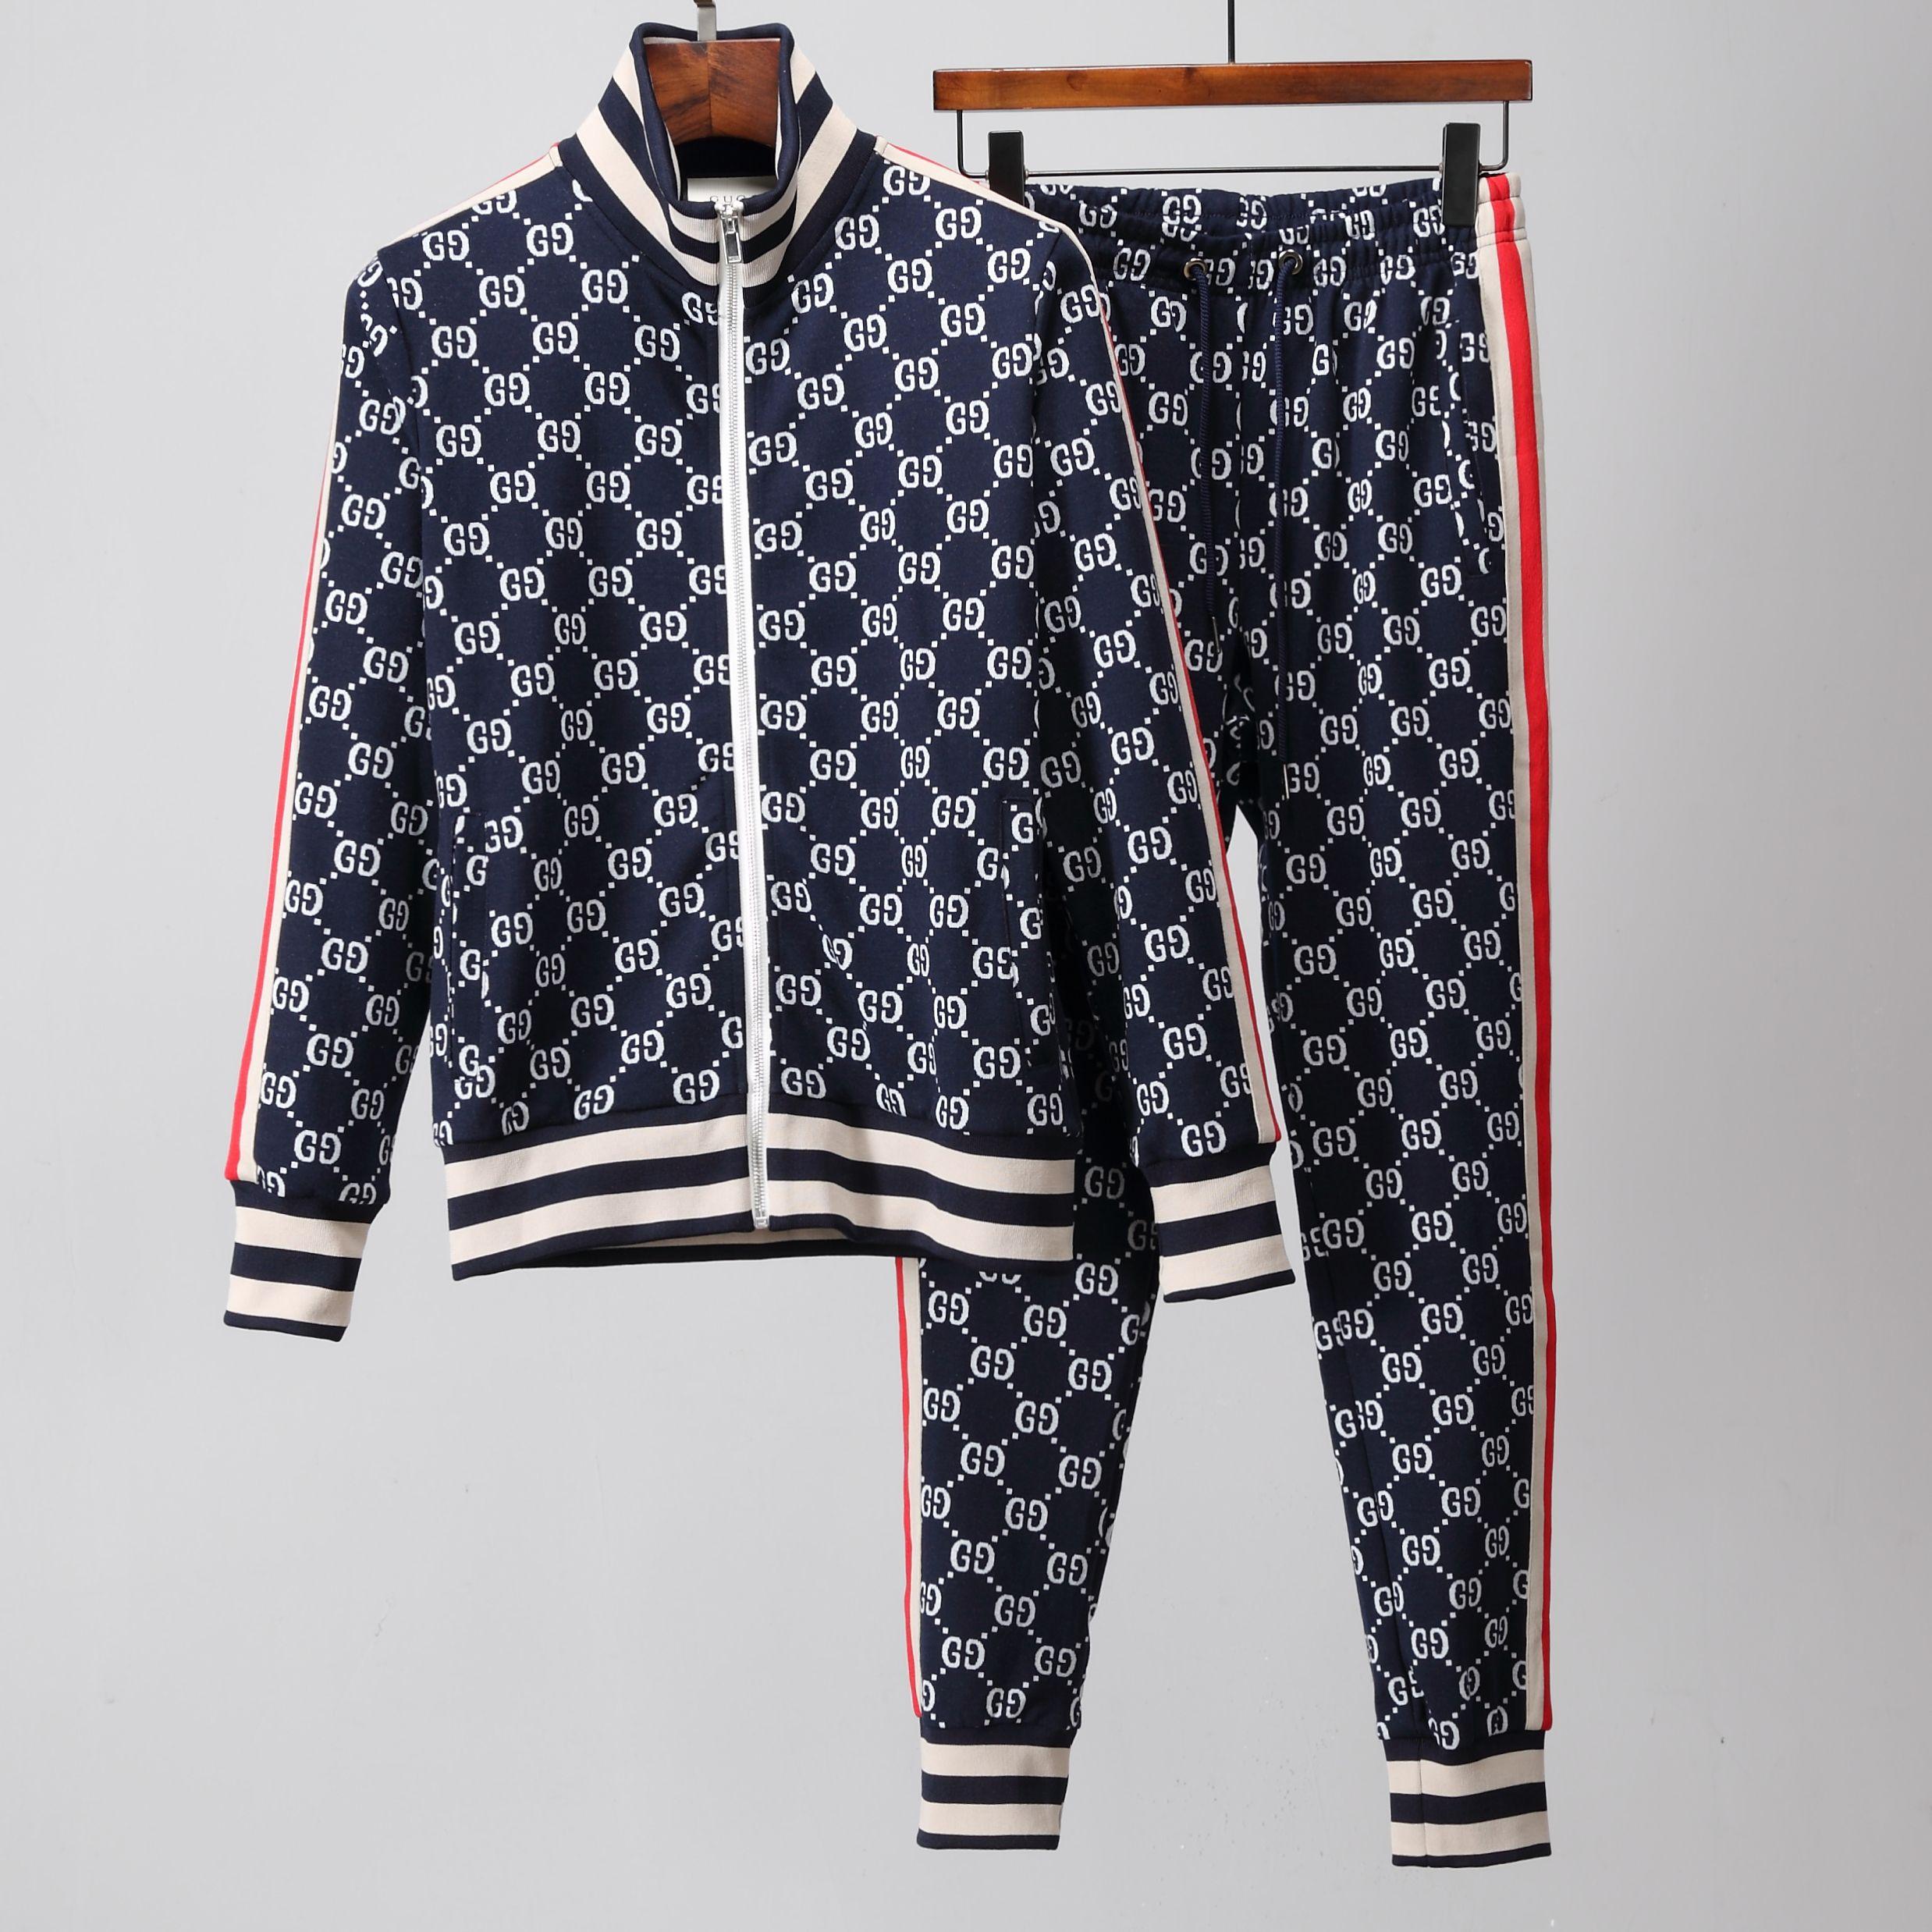 GGP Italy Designer Running jacket sports suit Brand Sweatshirt Suits Mens Medusa Casual Sportswear zipper Long sleeve Luxury tracksuit Kit